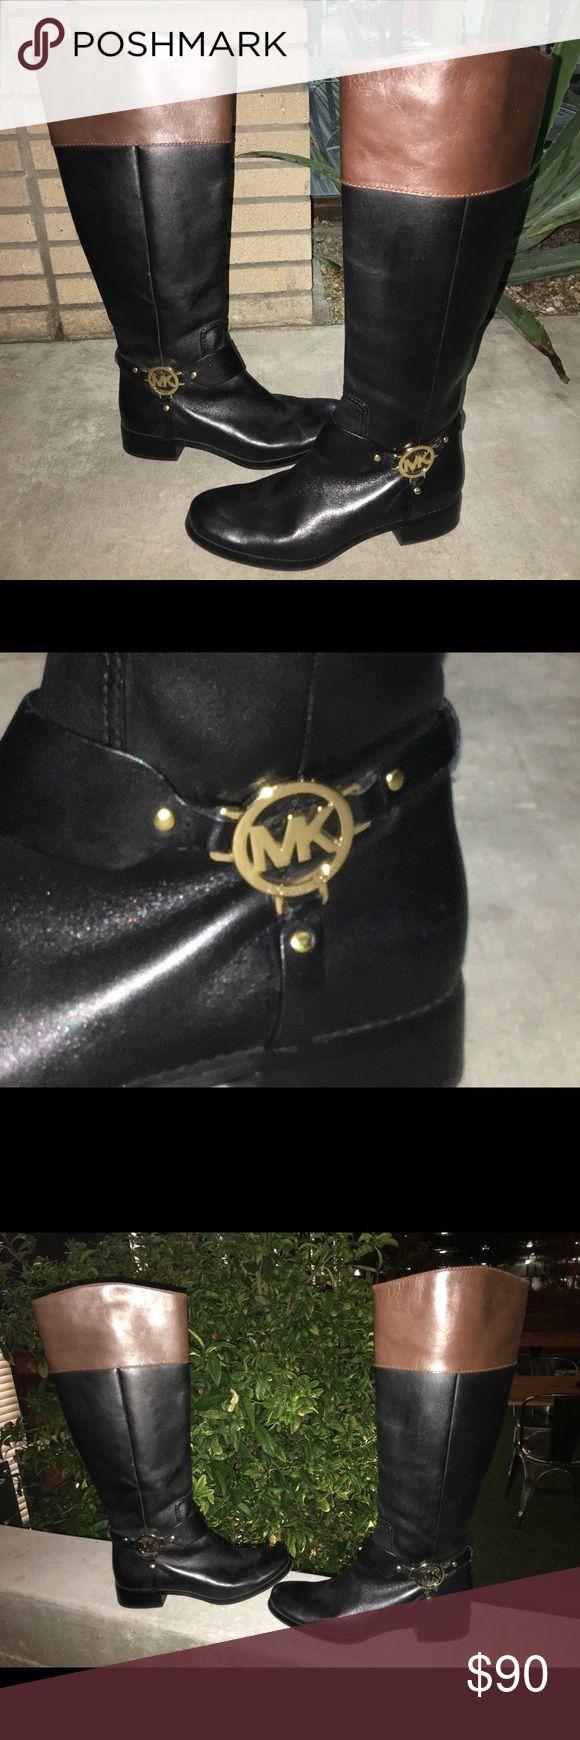 Michael Kors Equestrian leather riding boots SZ 8 Gorgeous, EXCELLENT LIKE NEW CONDITION, 2 tone genuine leather MICHAEL KORS EQUESTRIAN riding boots. $99 Michael Kors Shoes Winter & Rain Boots